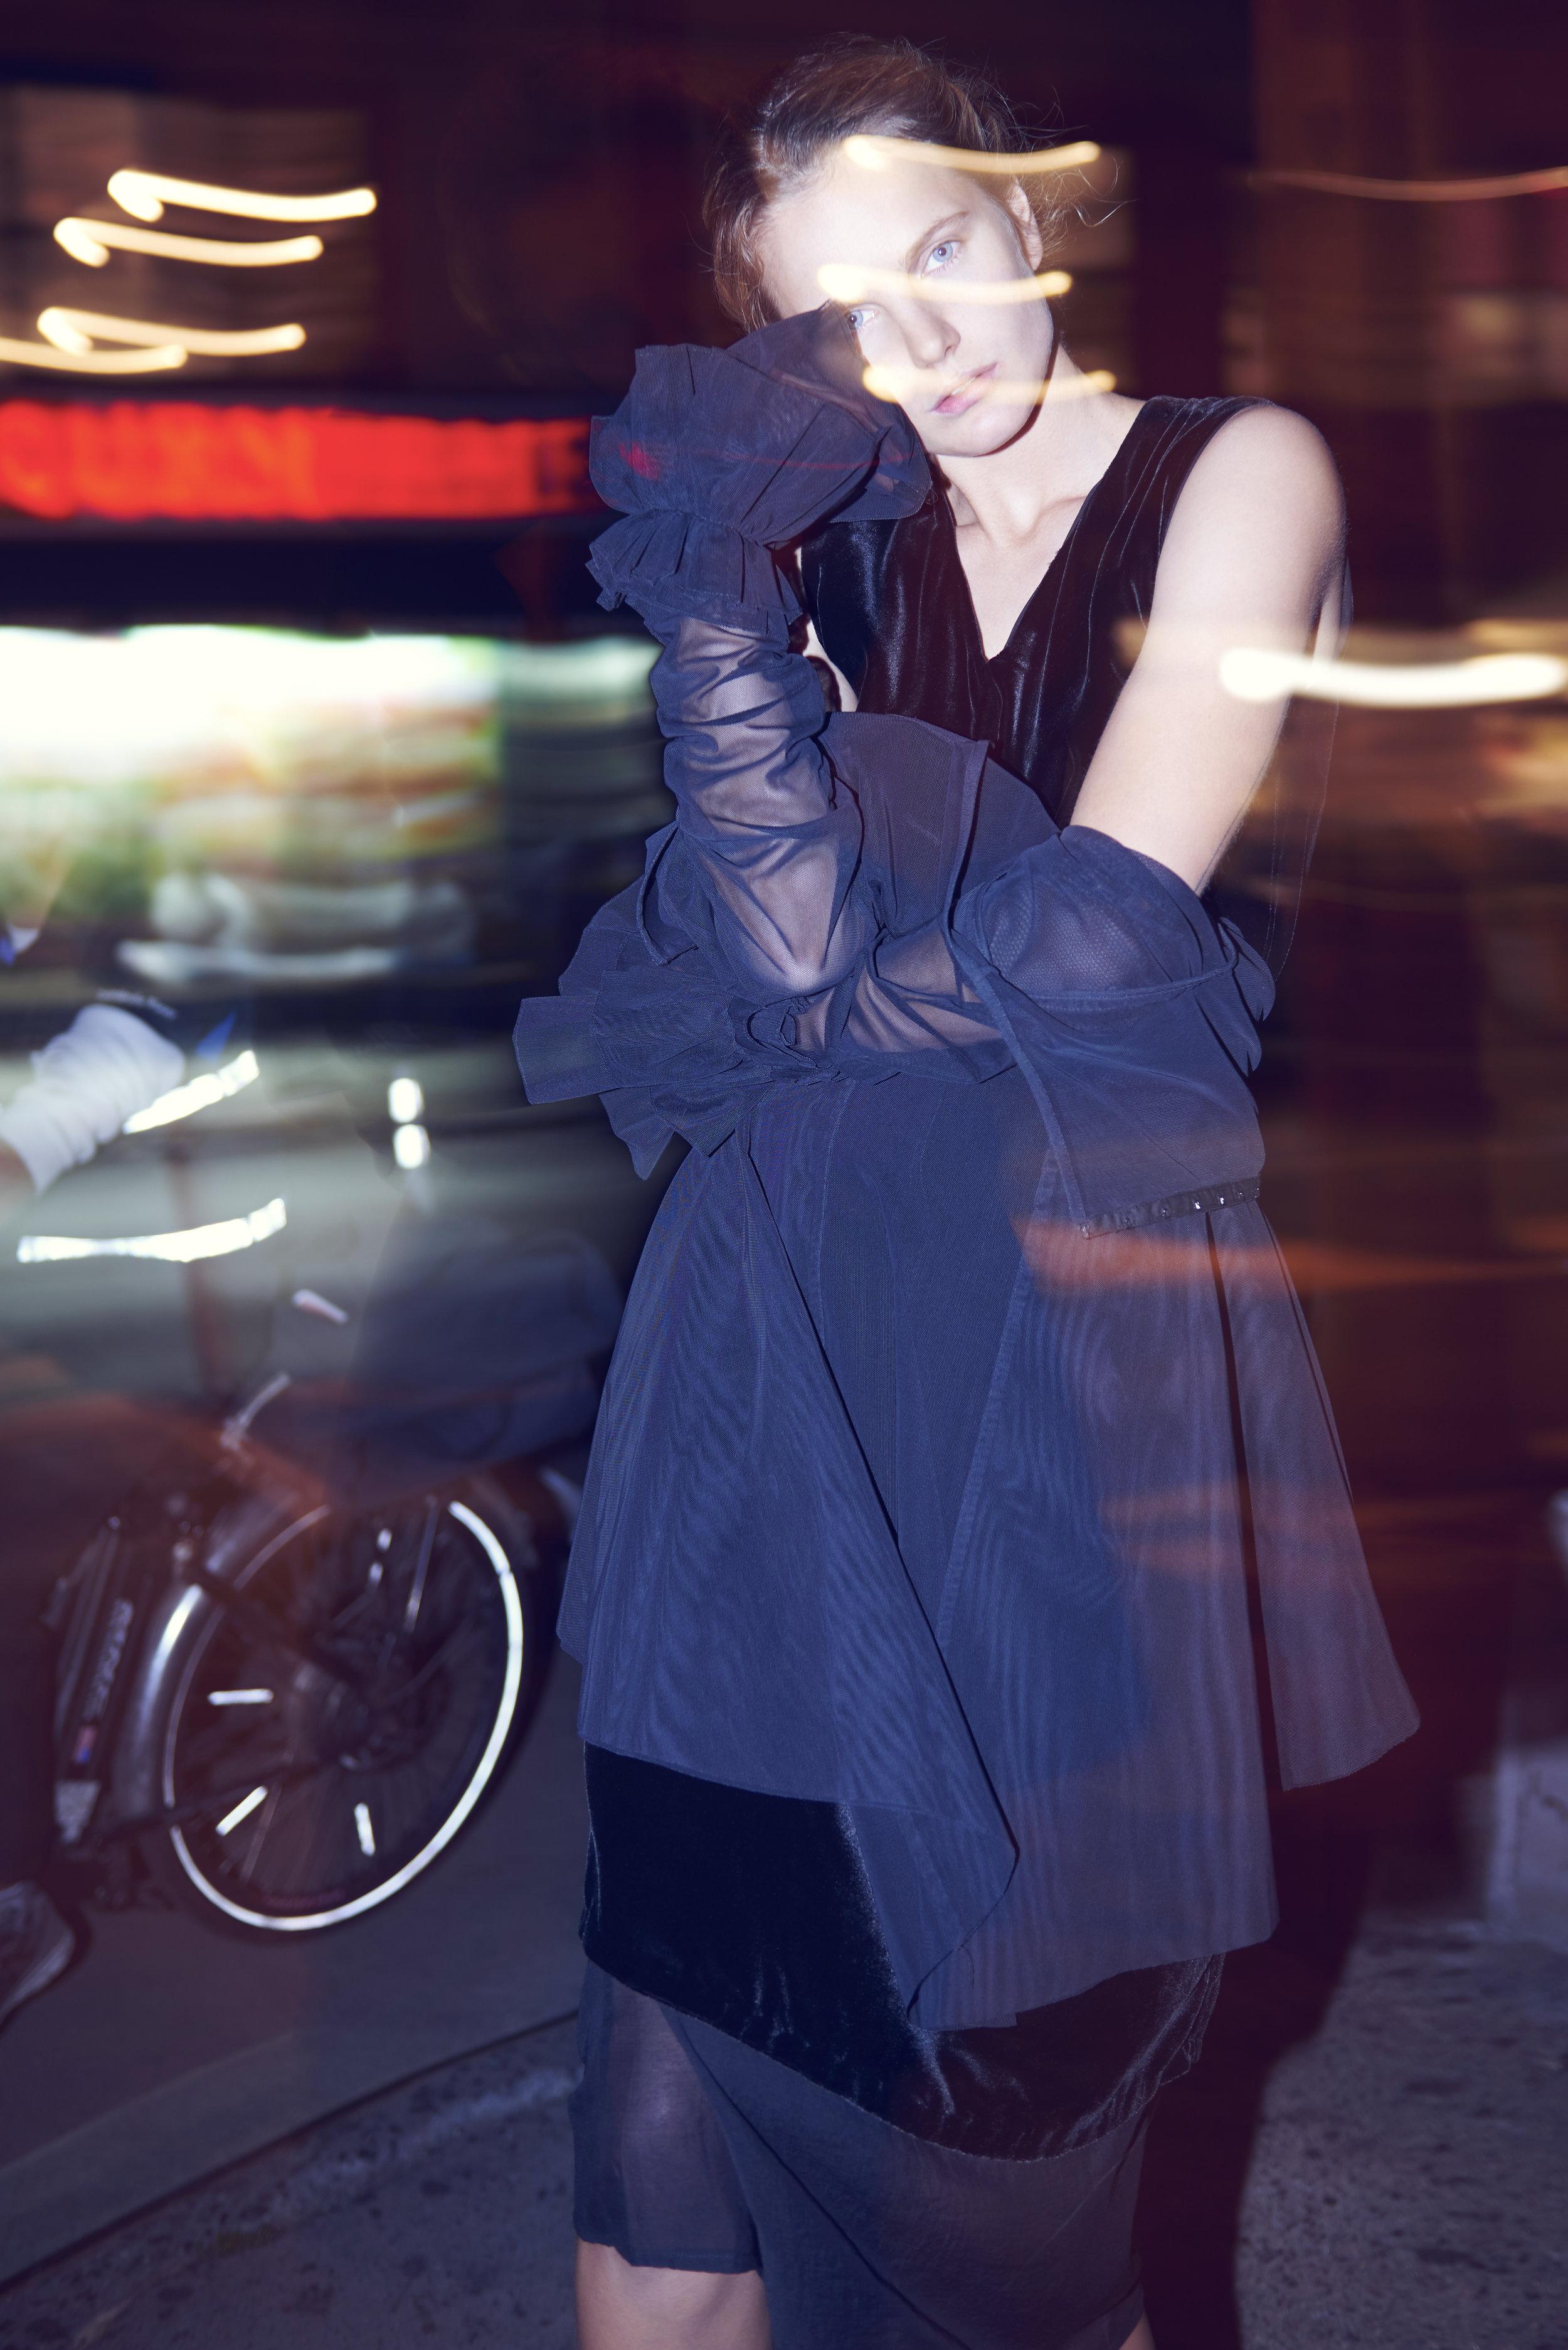 grayson hoffman kelsey randall night photo shoot les street style nightlife photography soho city bike black mesh sheer dress long sleeve